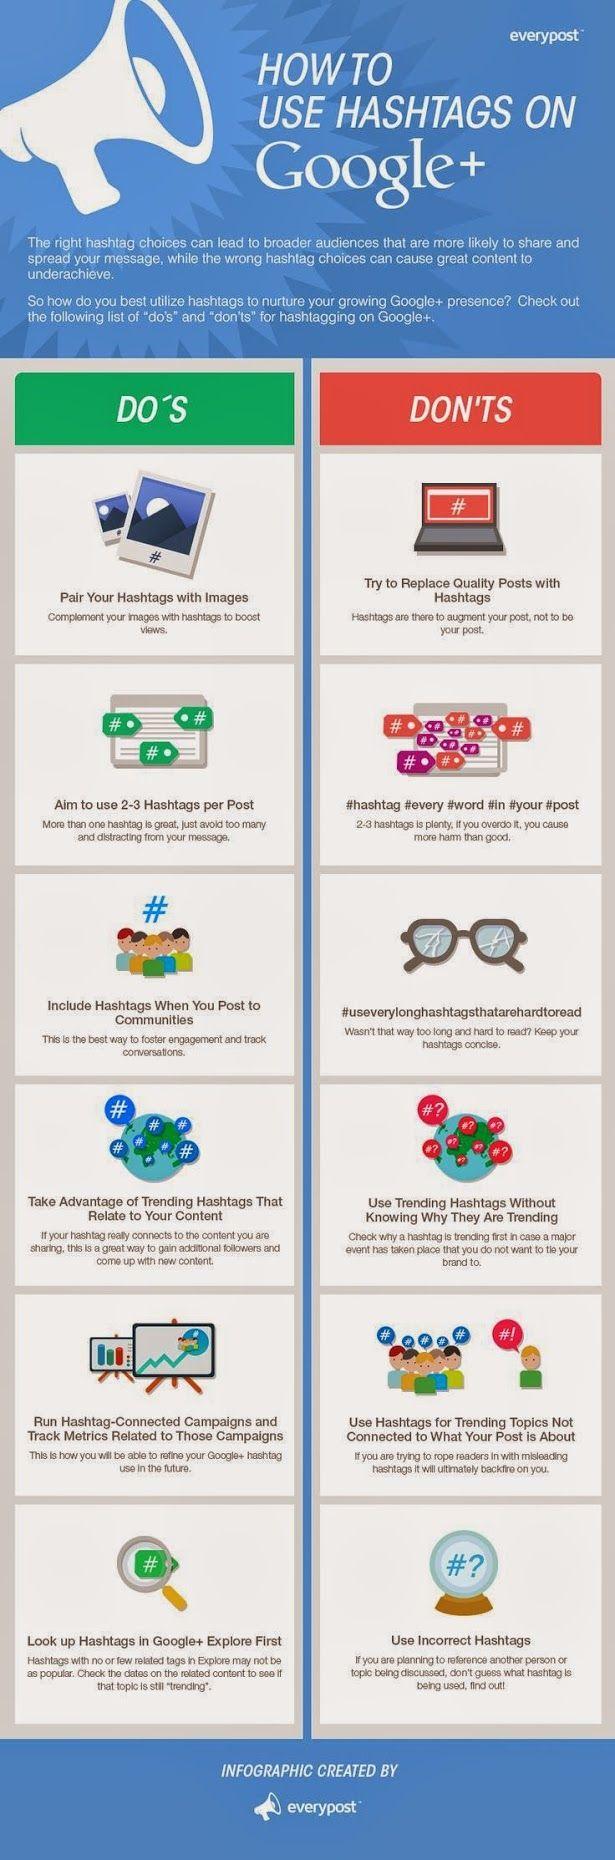 How to use #hashtags on #google Plus #socialmediamarketing